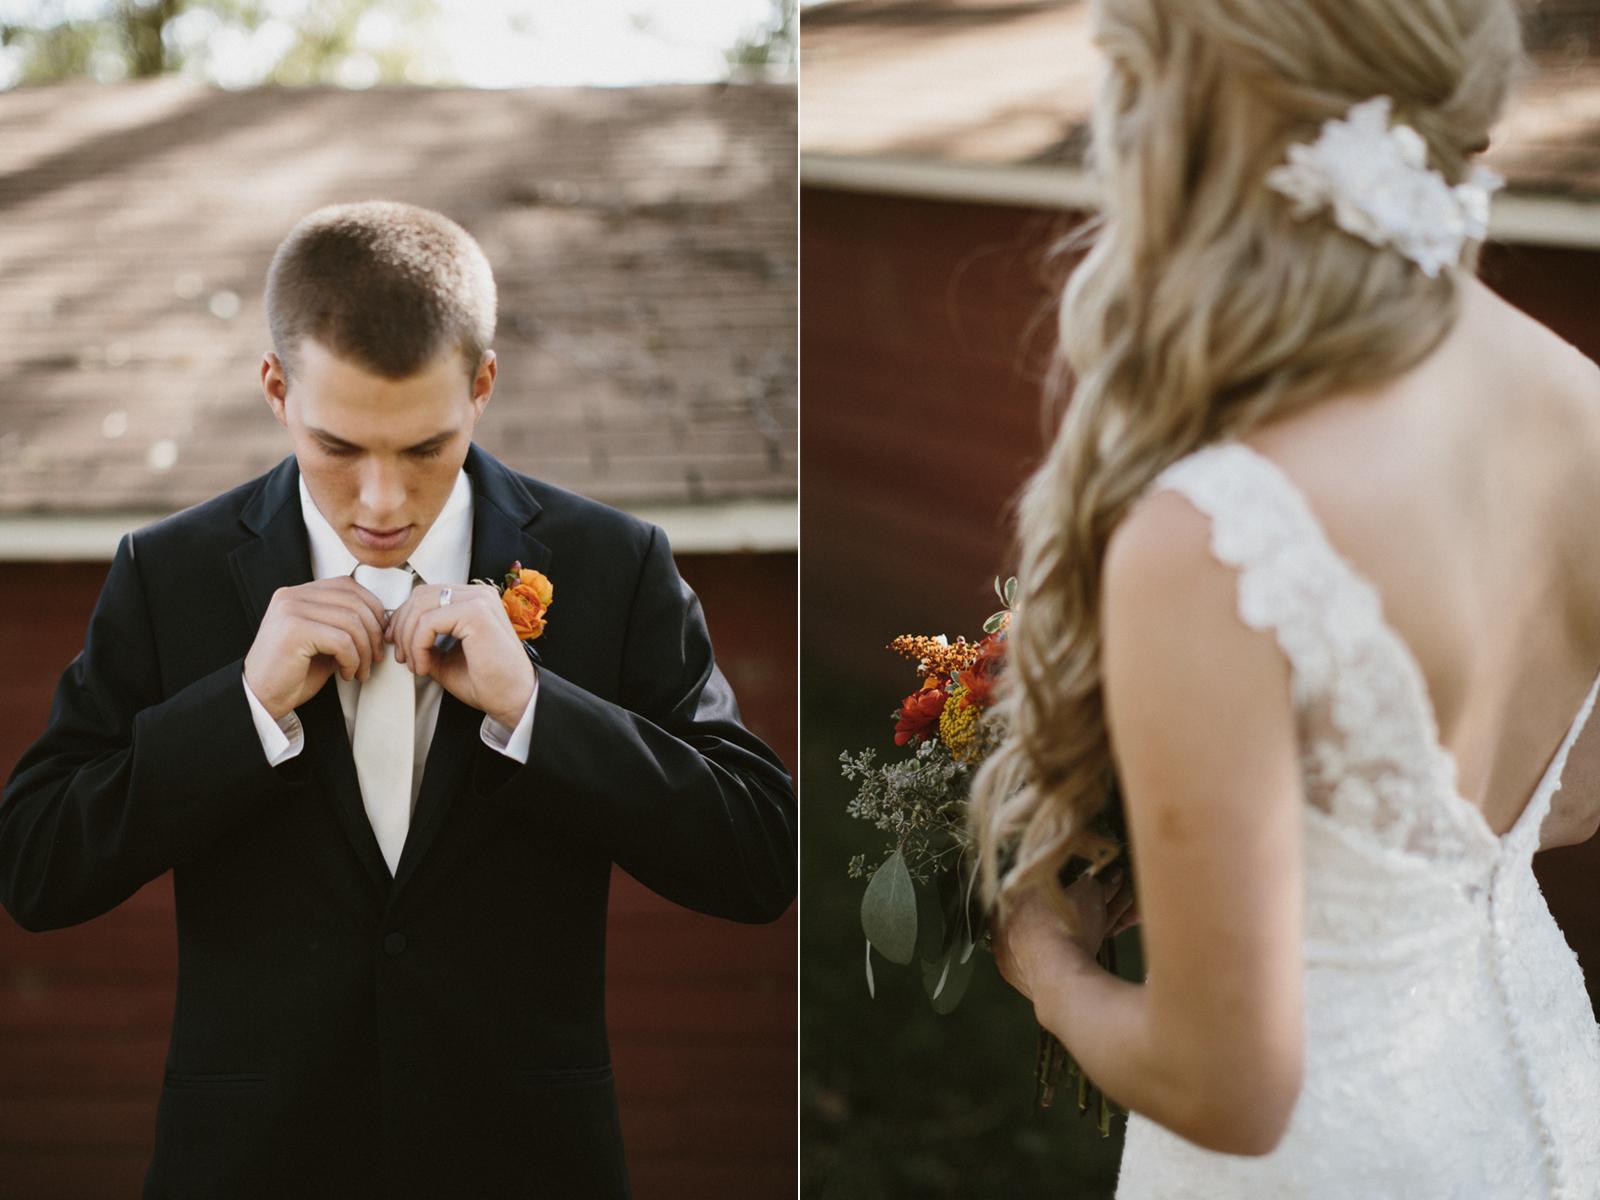 SiouxFalls_DesMoines_Wedding_Photographer_23.jpg